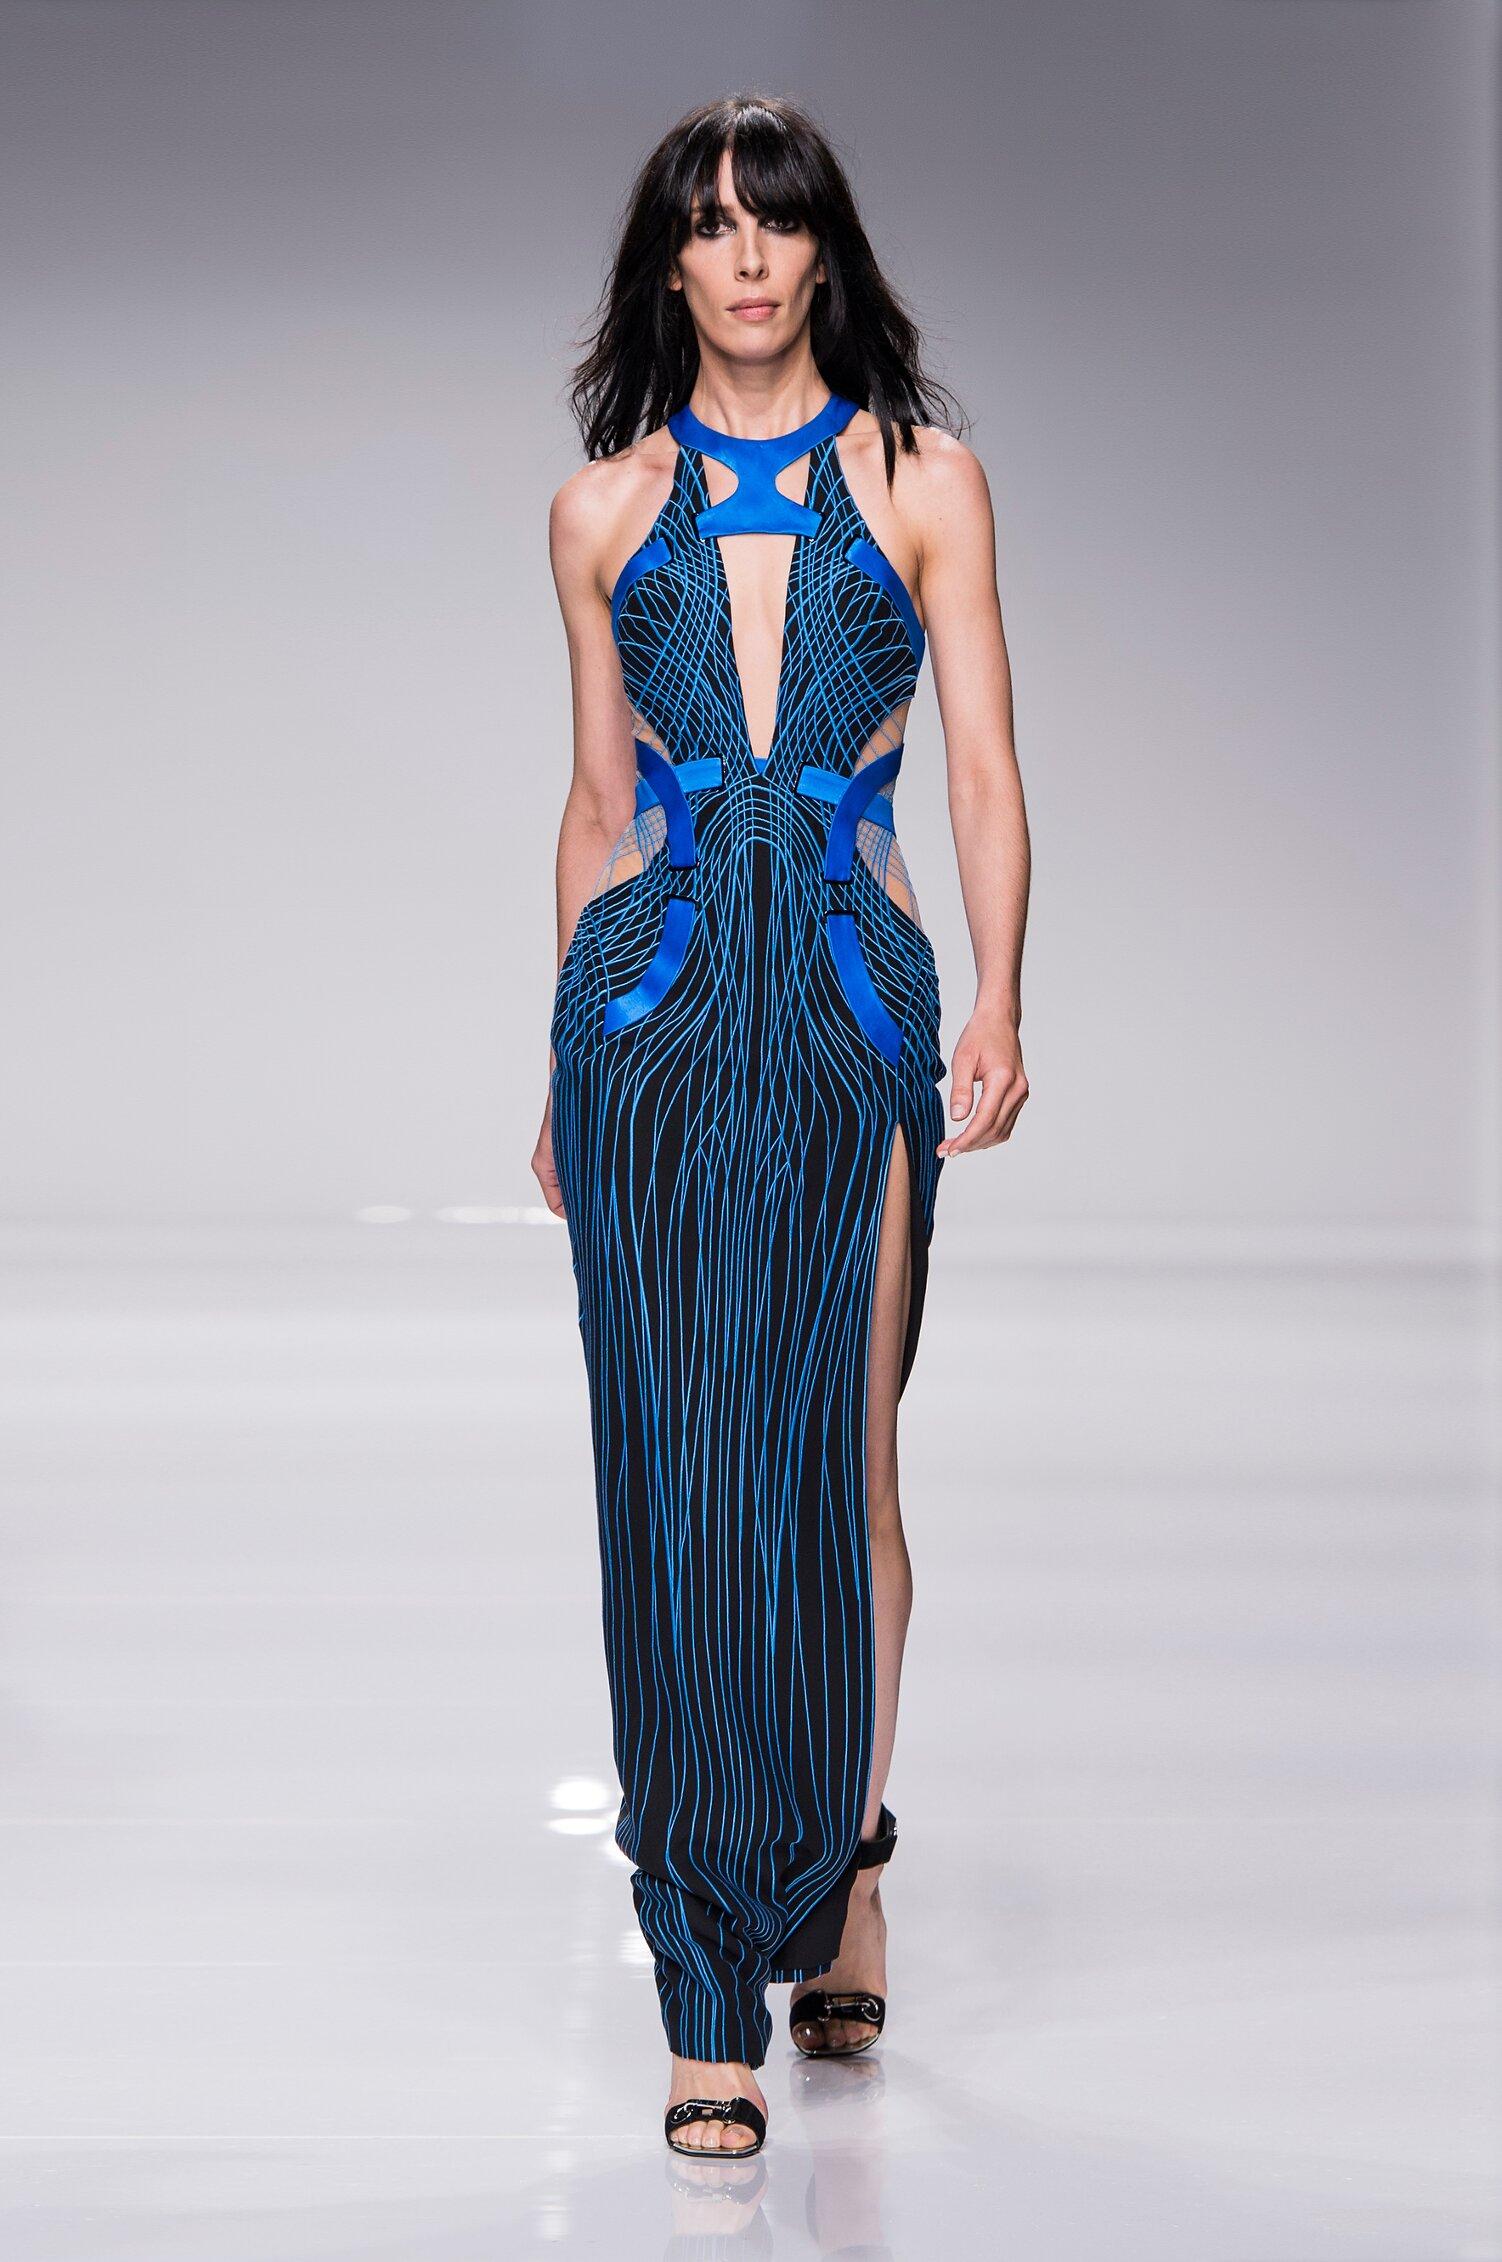 Fashion Model Atelier Versace Couture Catwalk